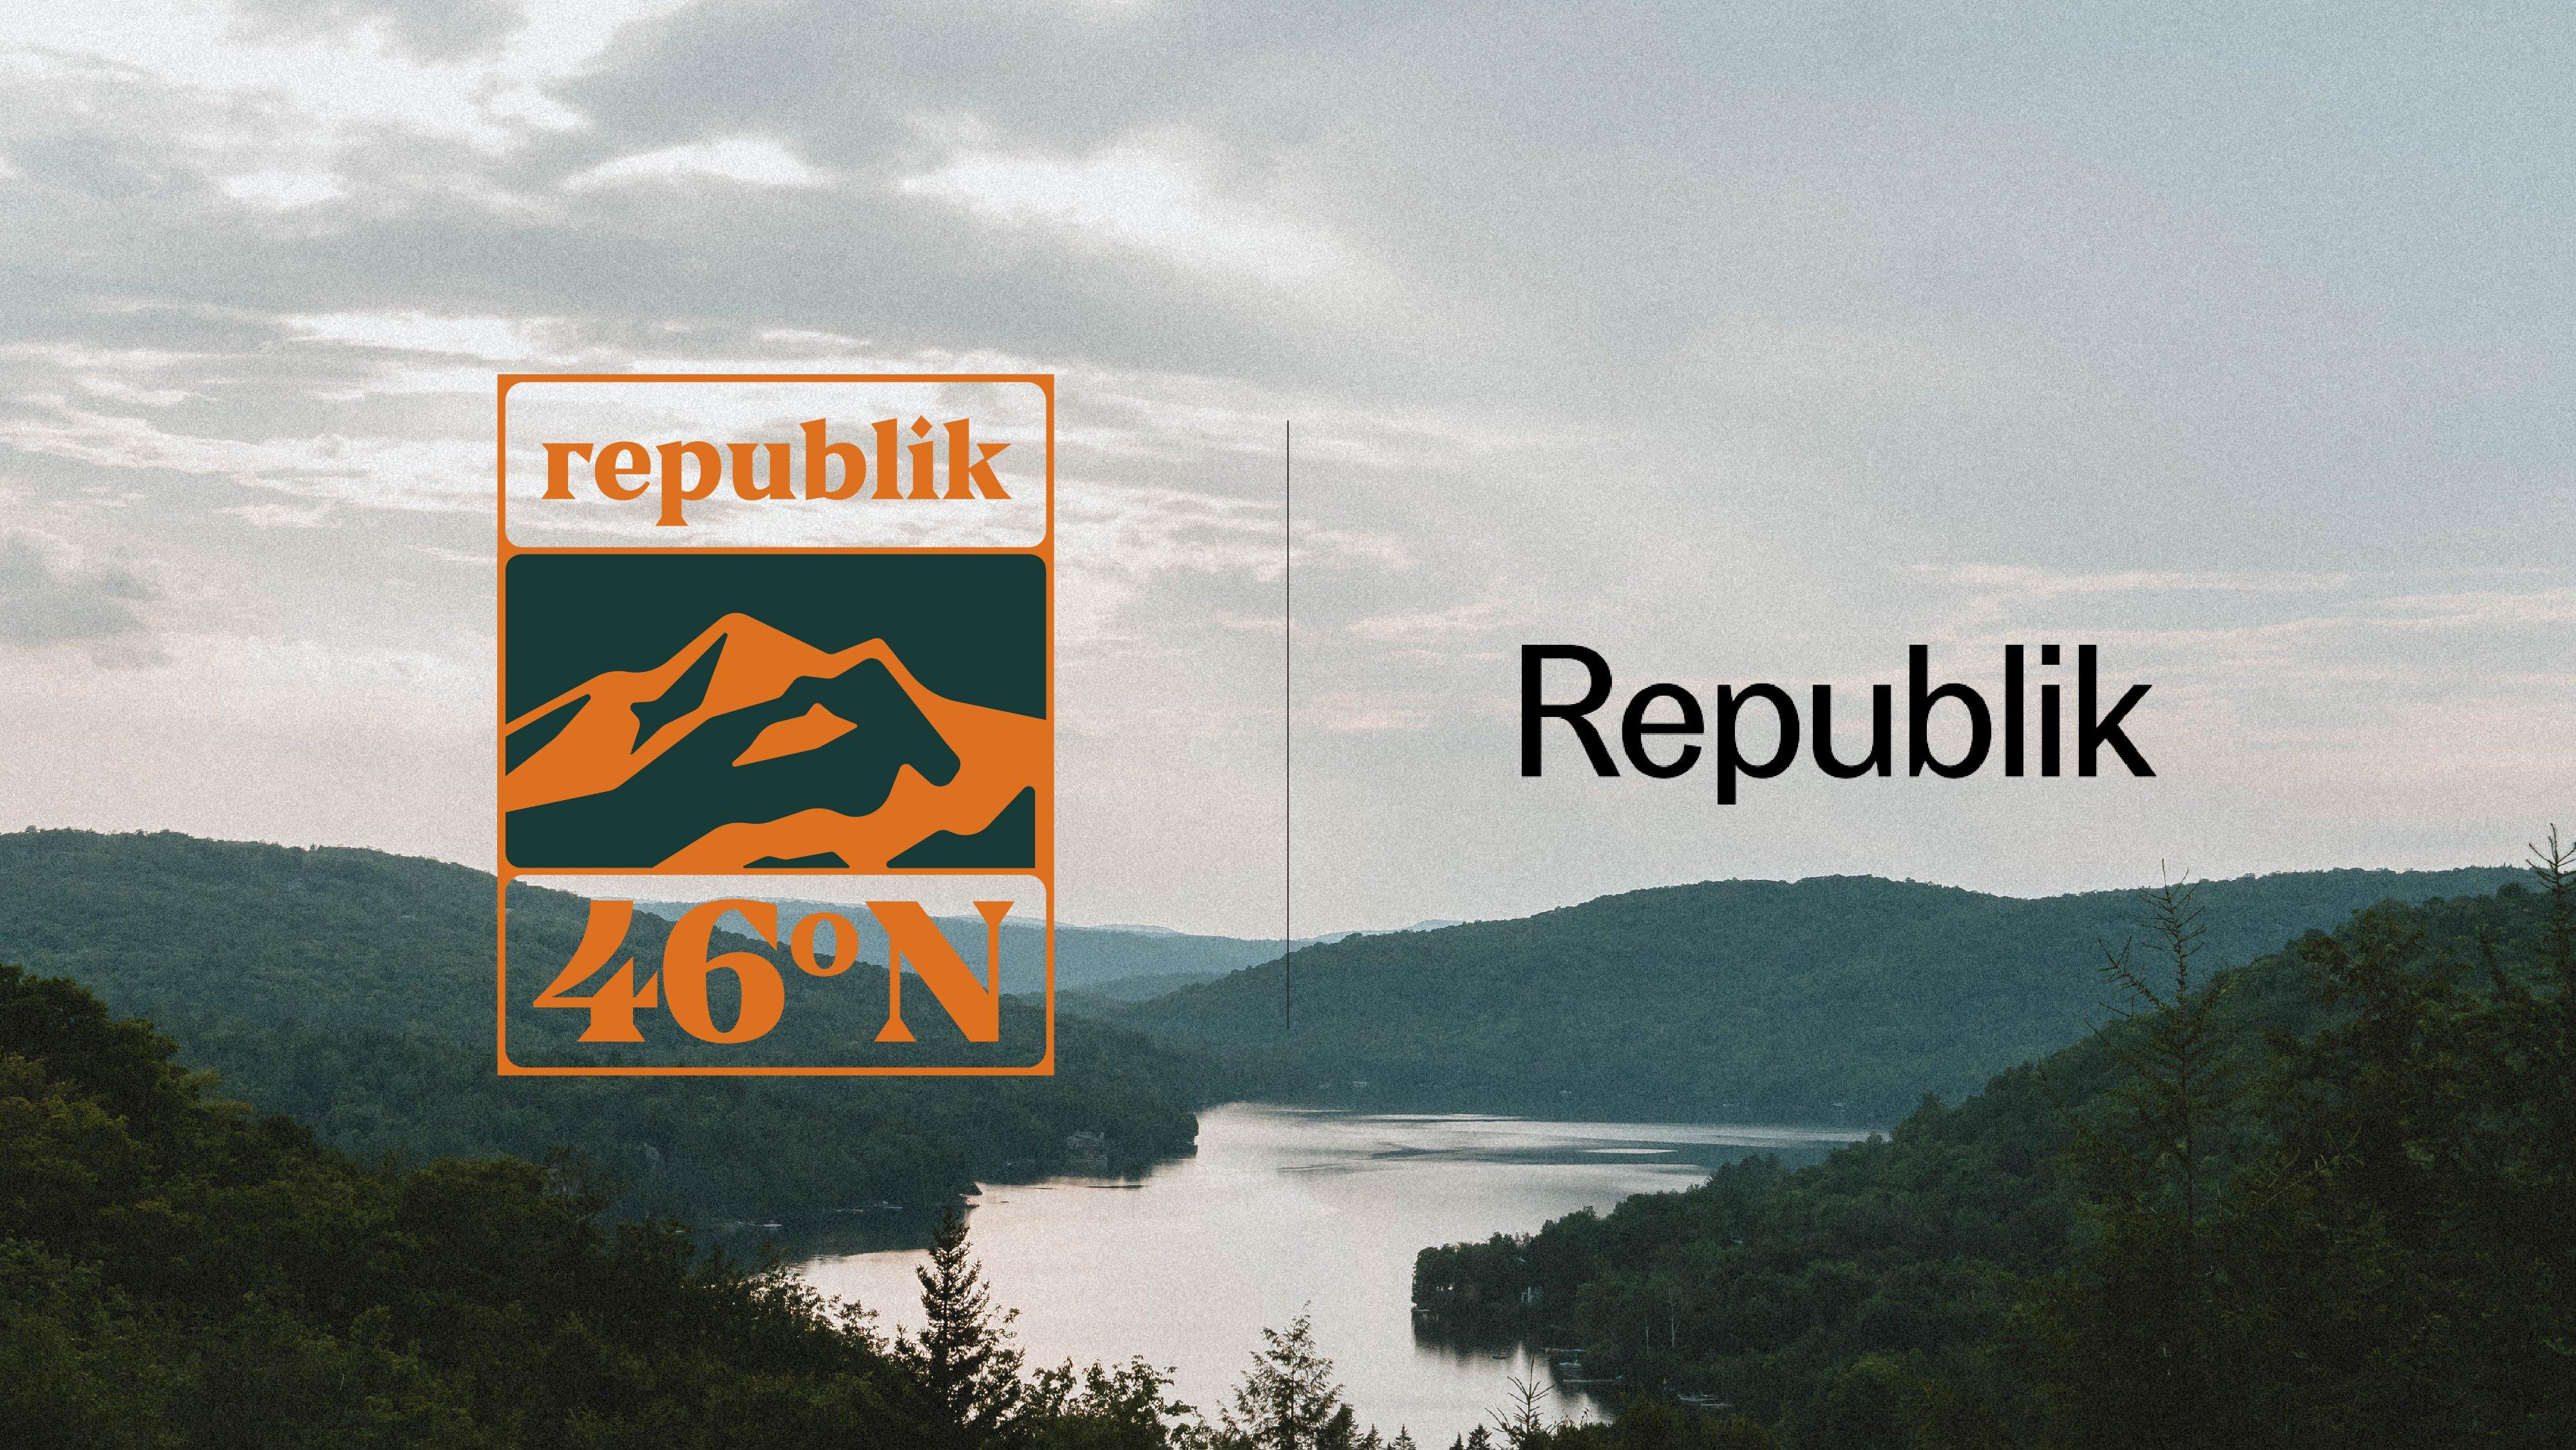 republik 3